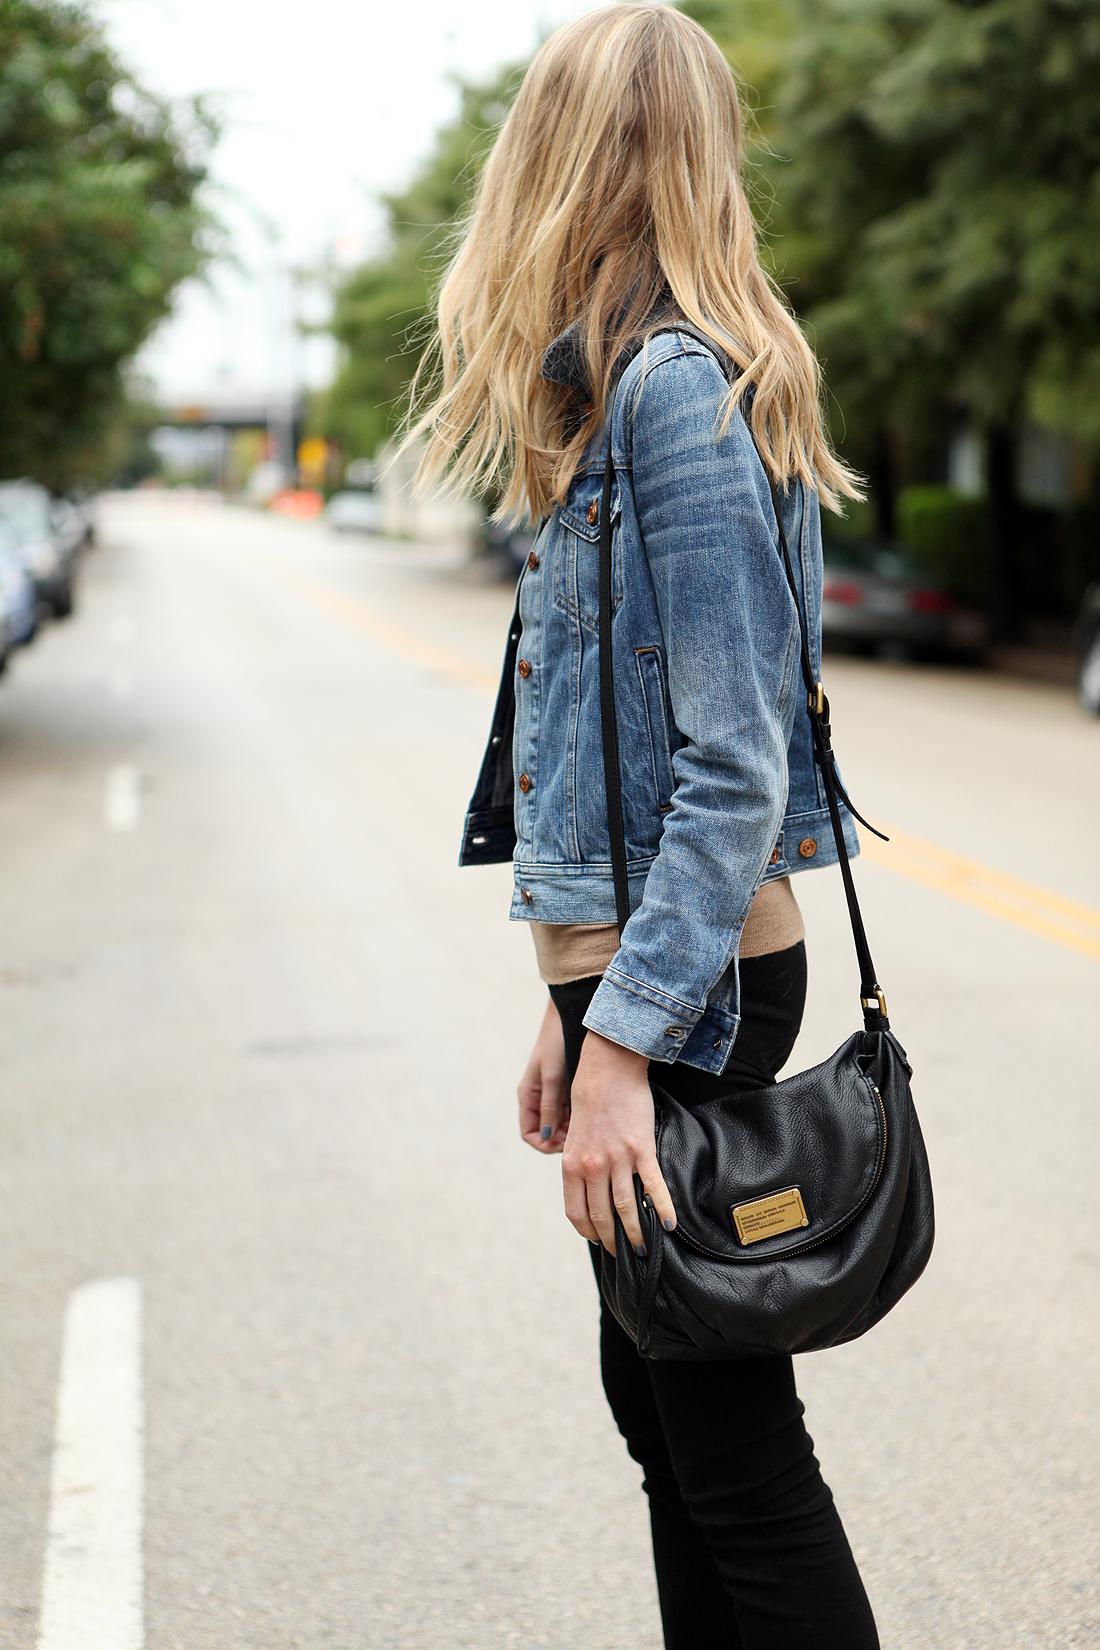 fashion-jackson-jcrew-denim-jacket-marc-by-marc-jacobs-natasha-handbag